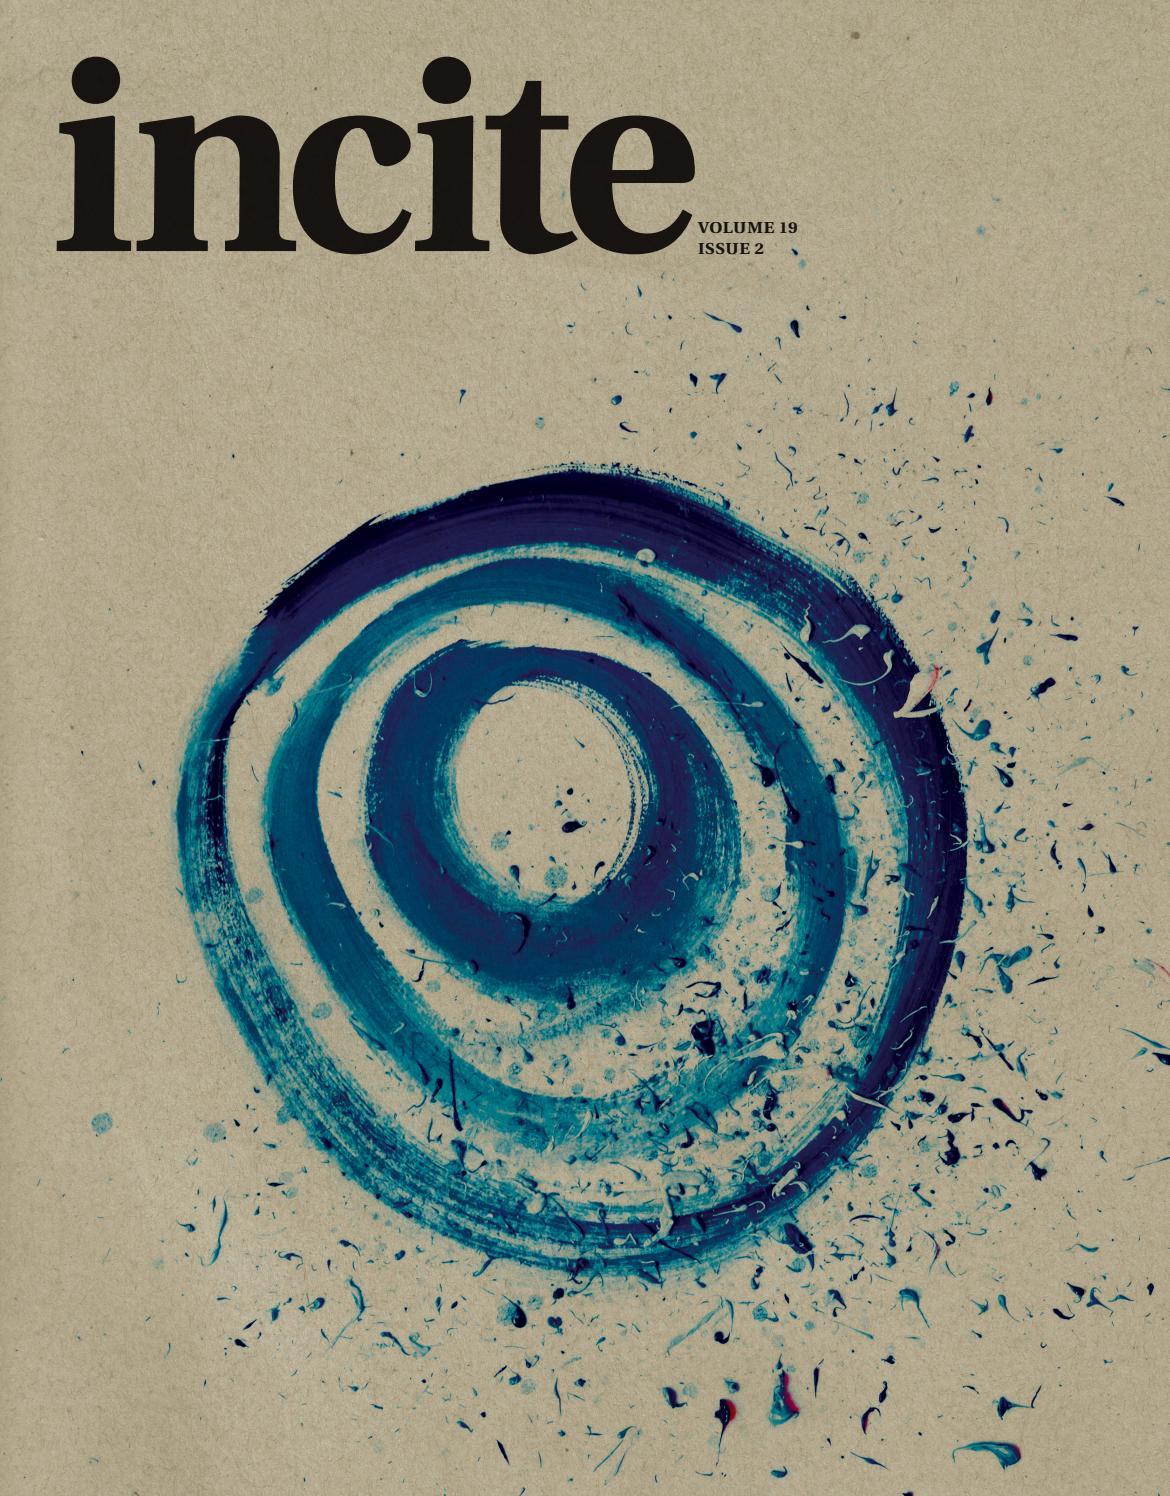 Incite Magazine – December 2016 by Incite Magazine - issuu